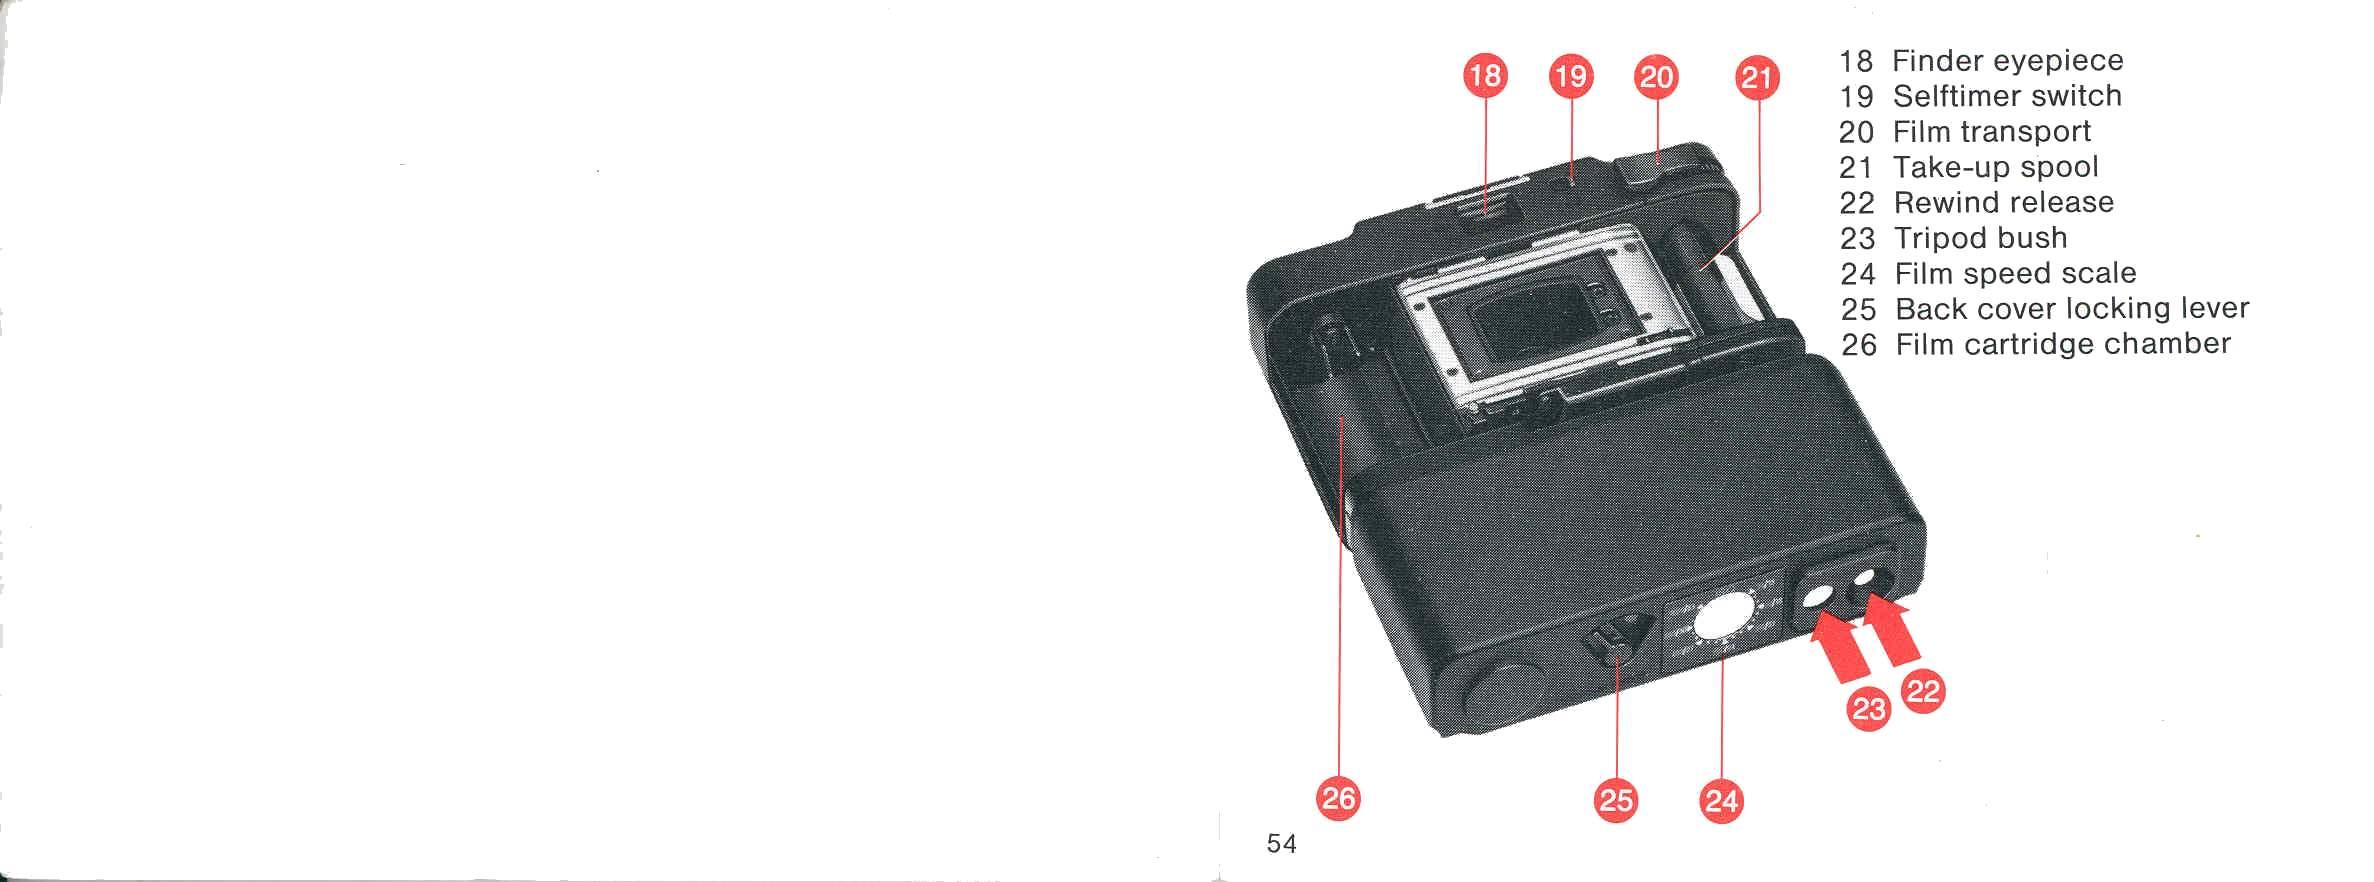 Minox 35 GT manual